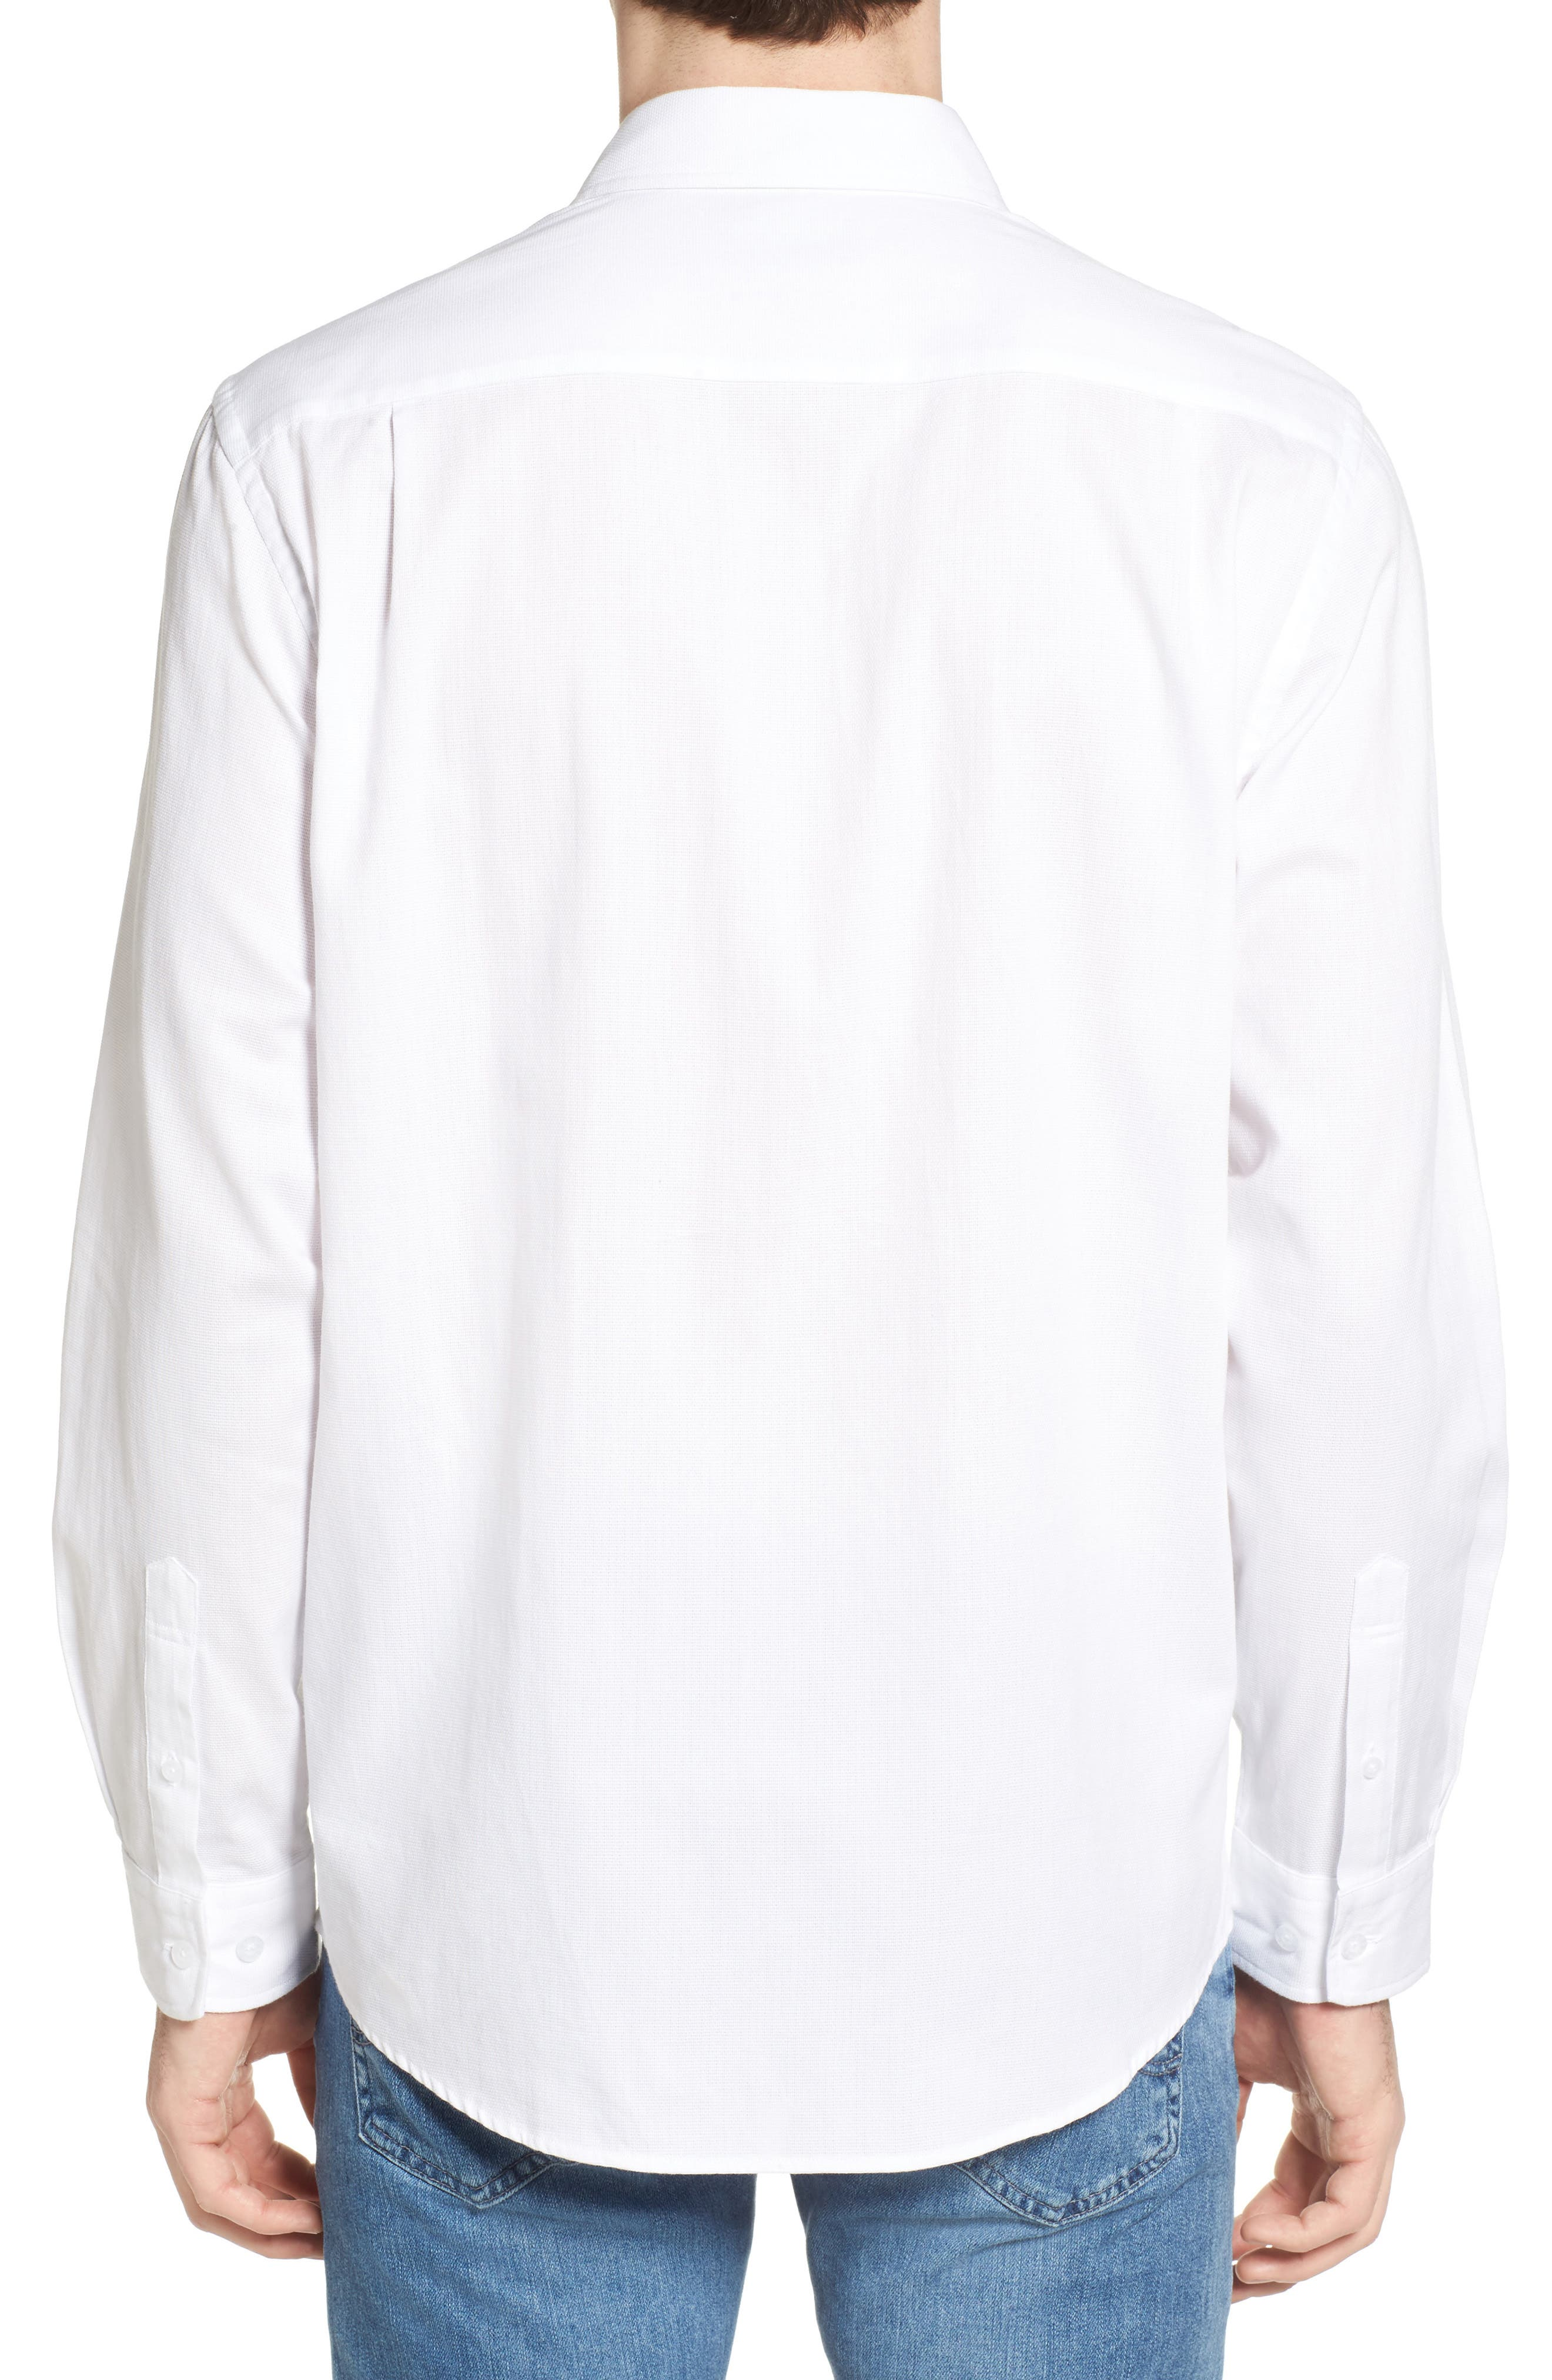 Mount Hutton Sport Shirt,                             Alternate thumbnail 2, color,                             111